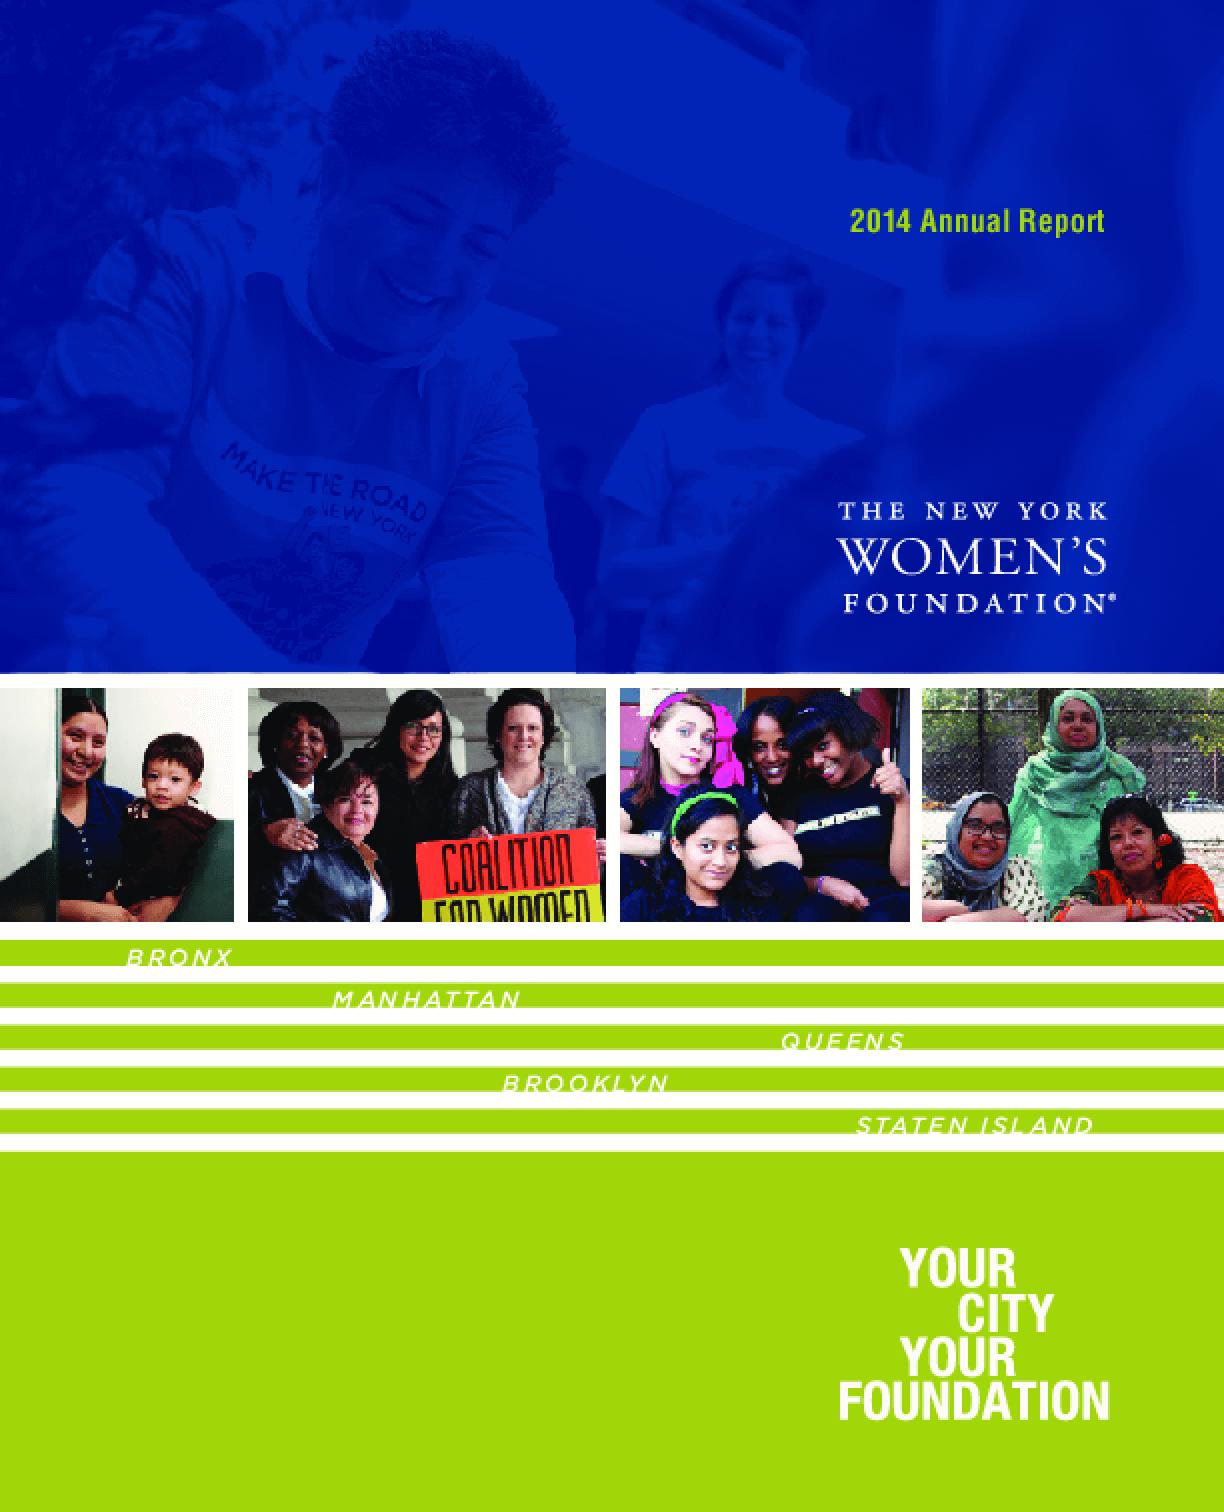 New York Women's Foundation, 2014 Annual report